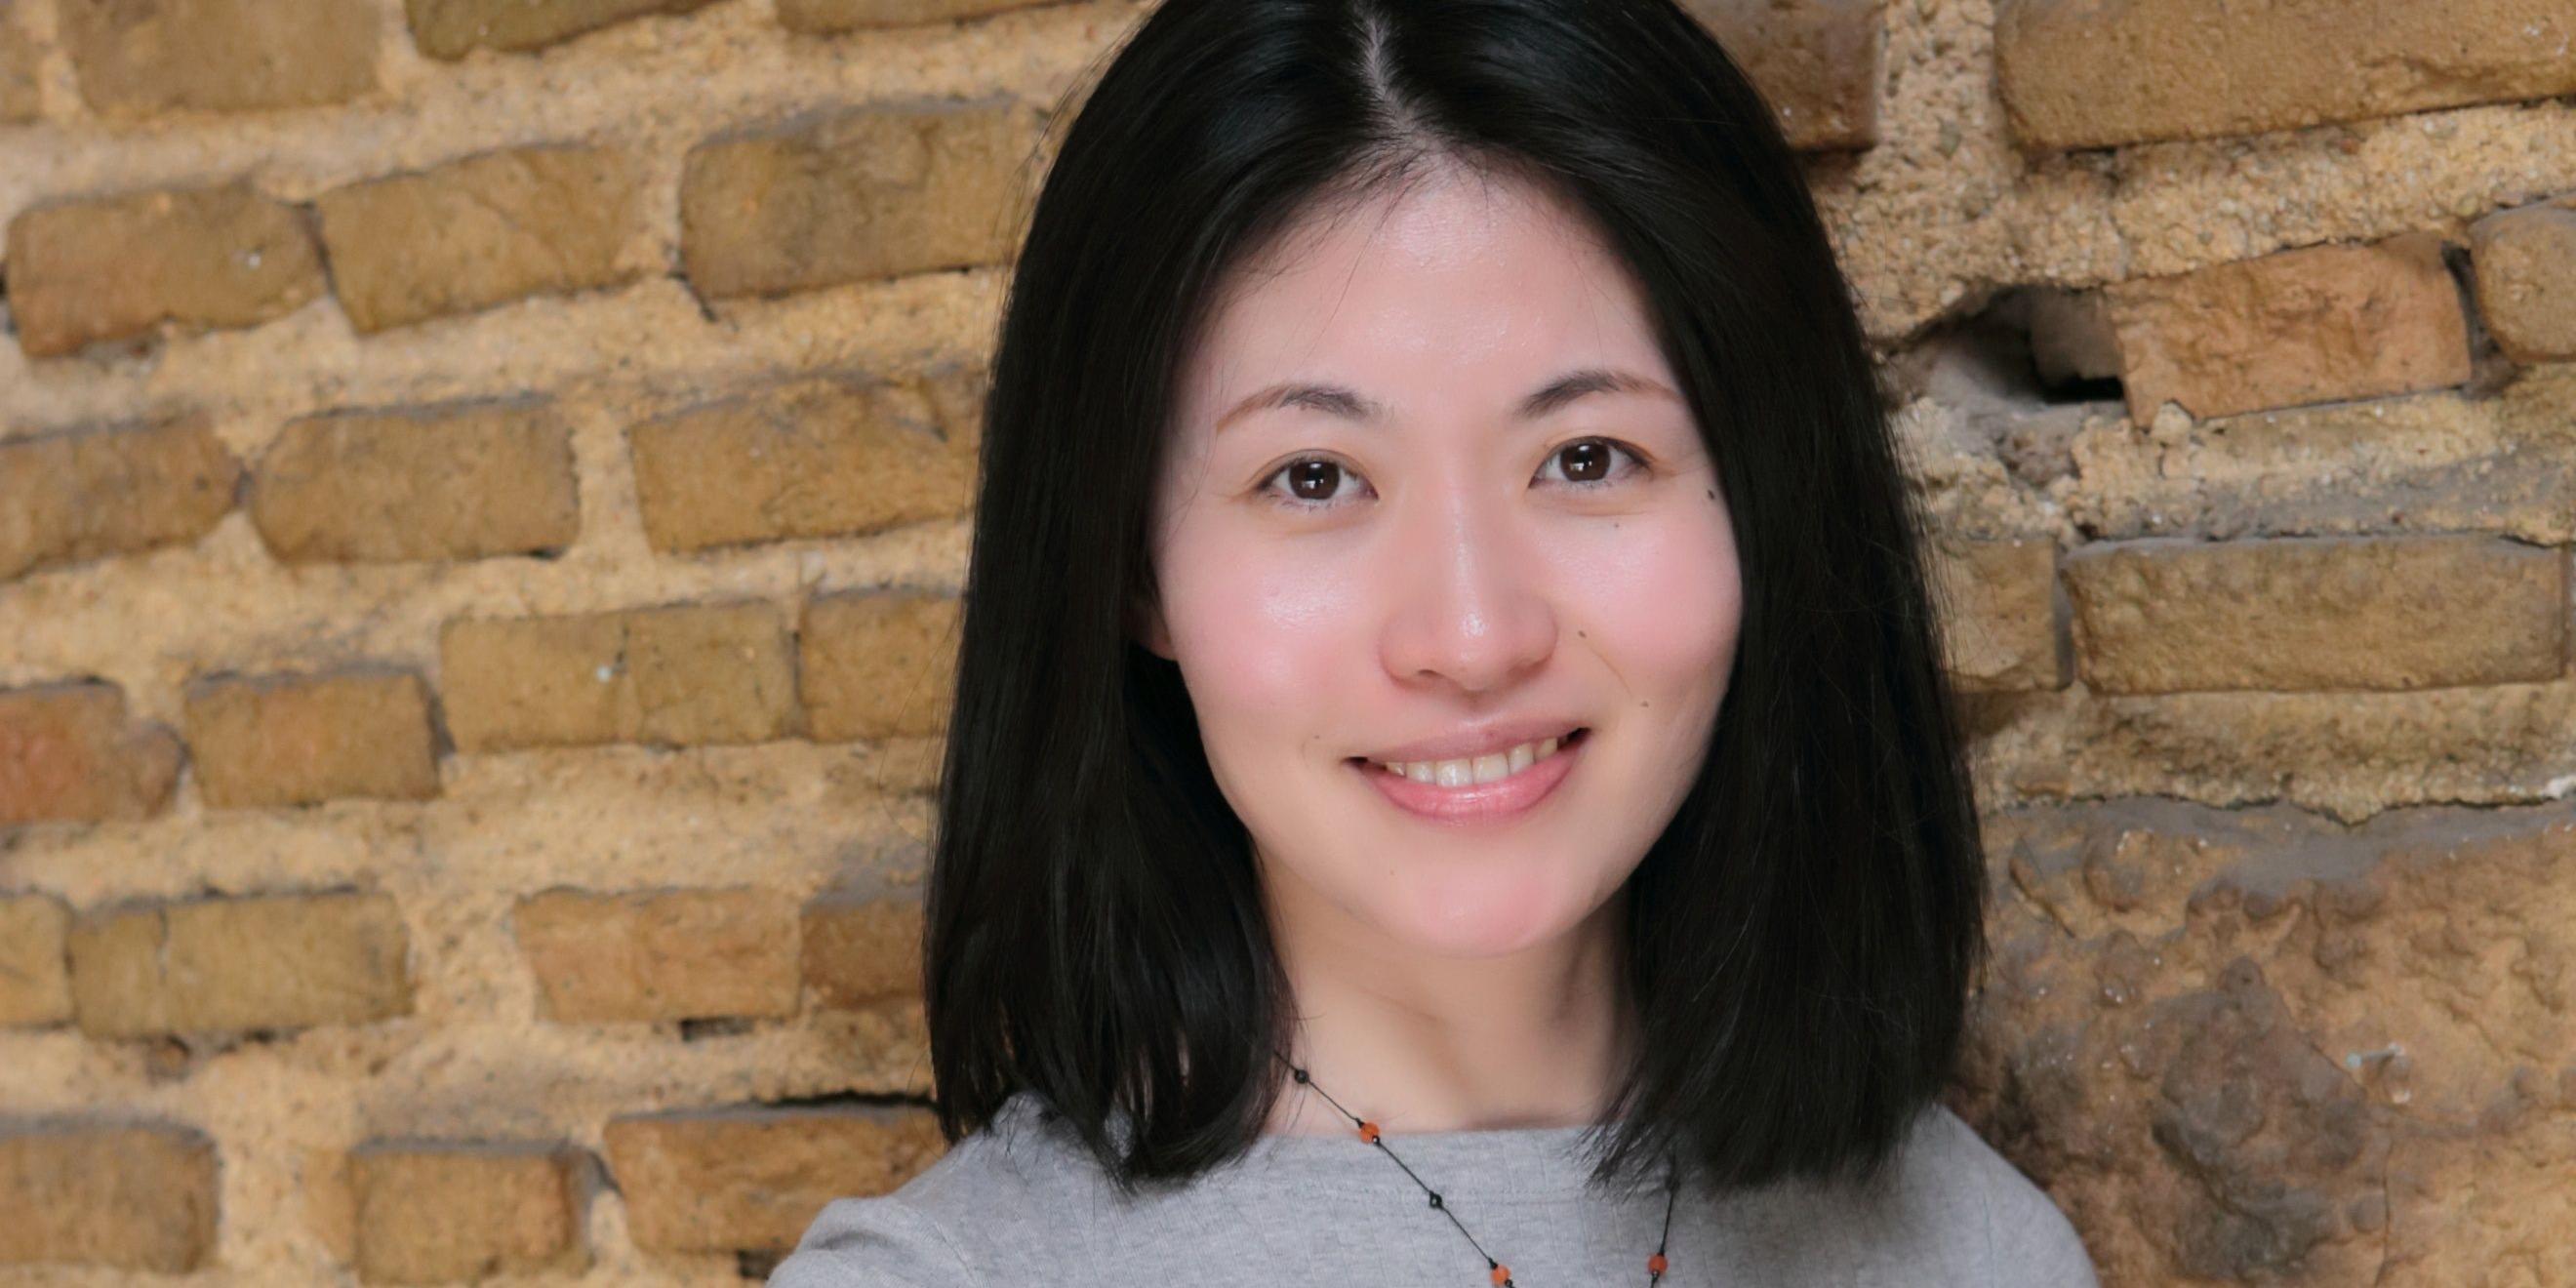 Miyi Zhu, China, participant in the GCLP 2017 edition